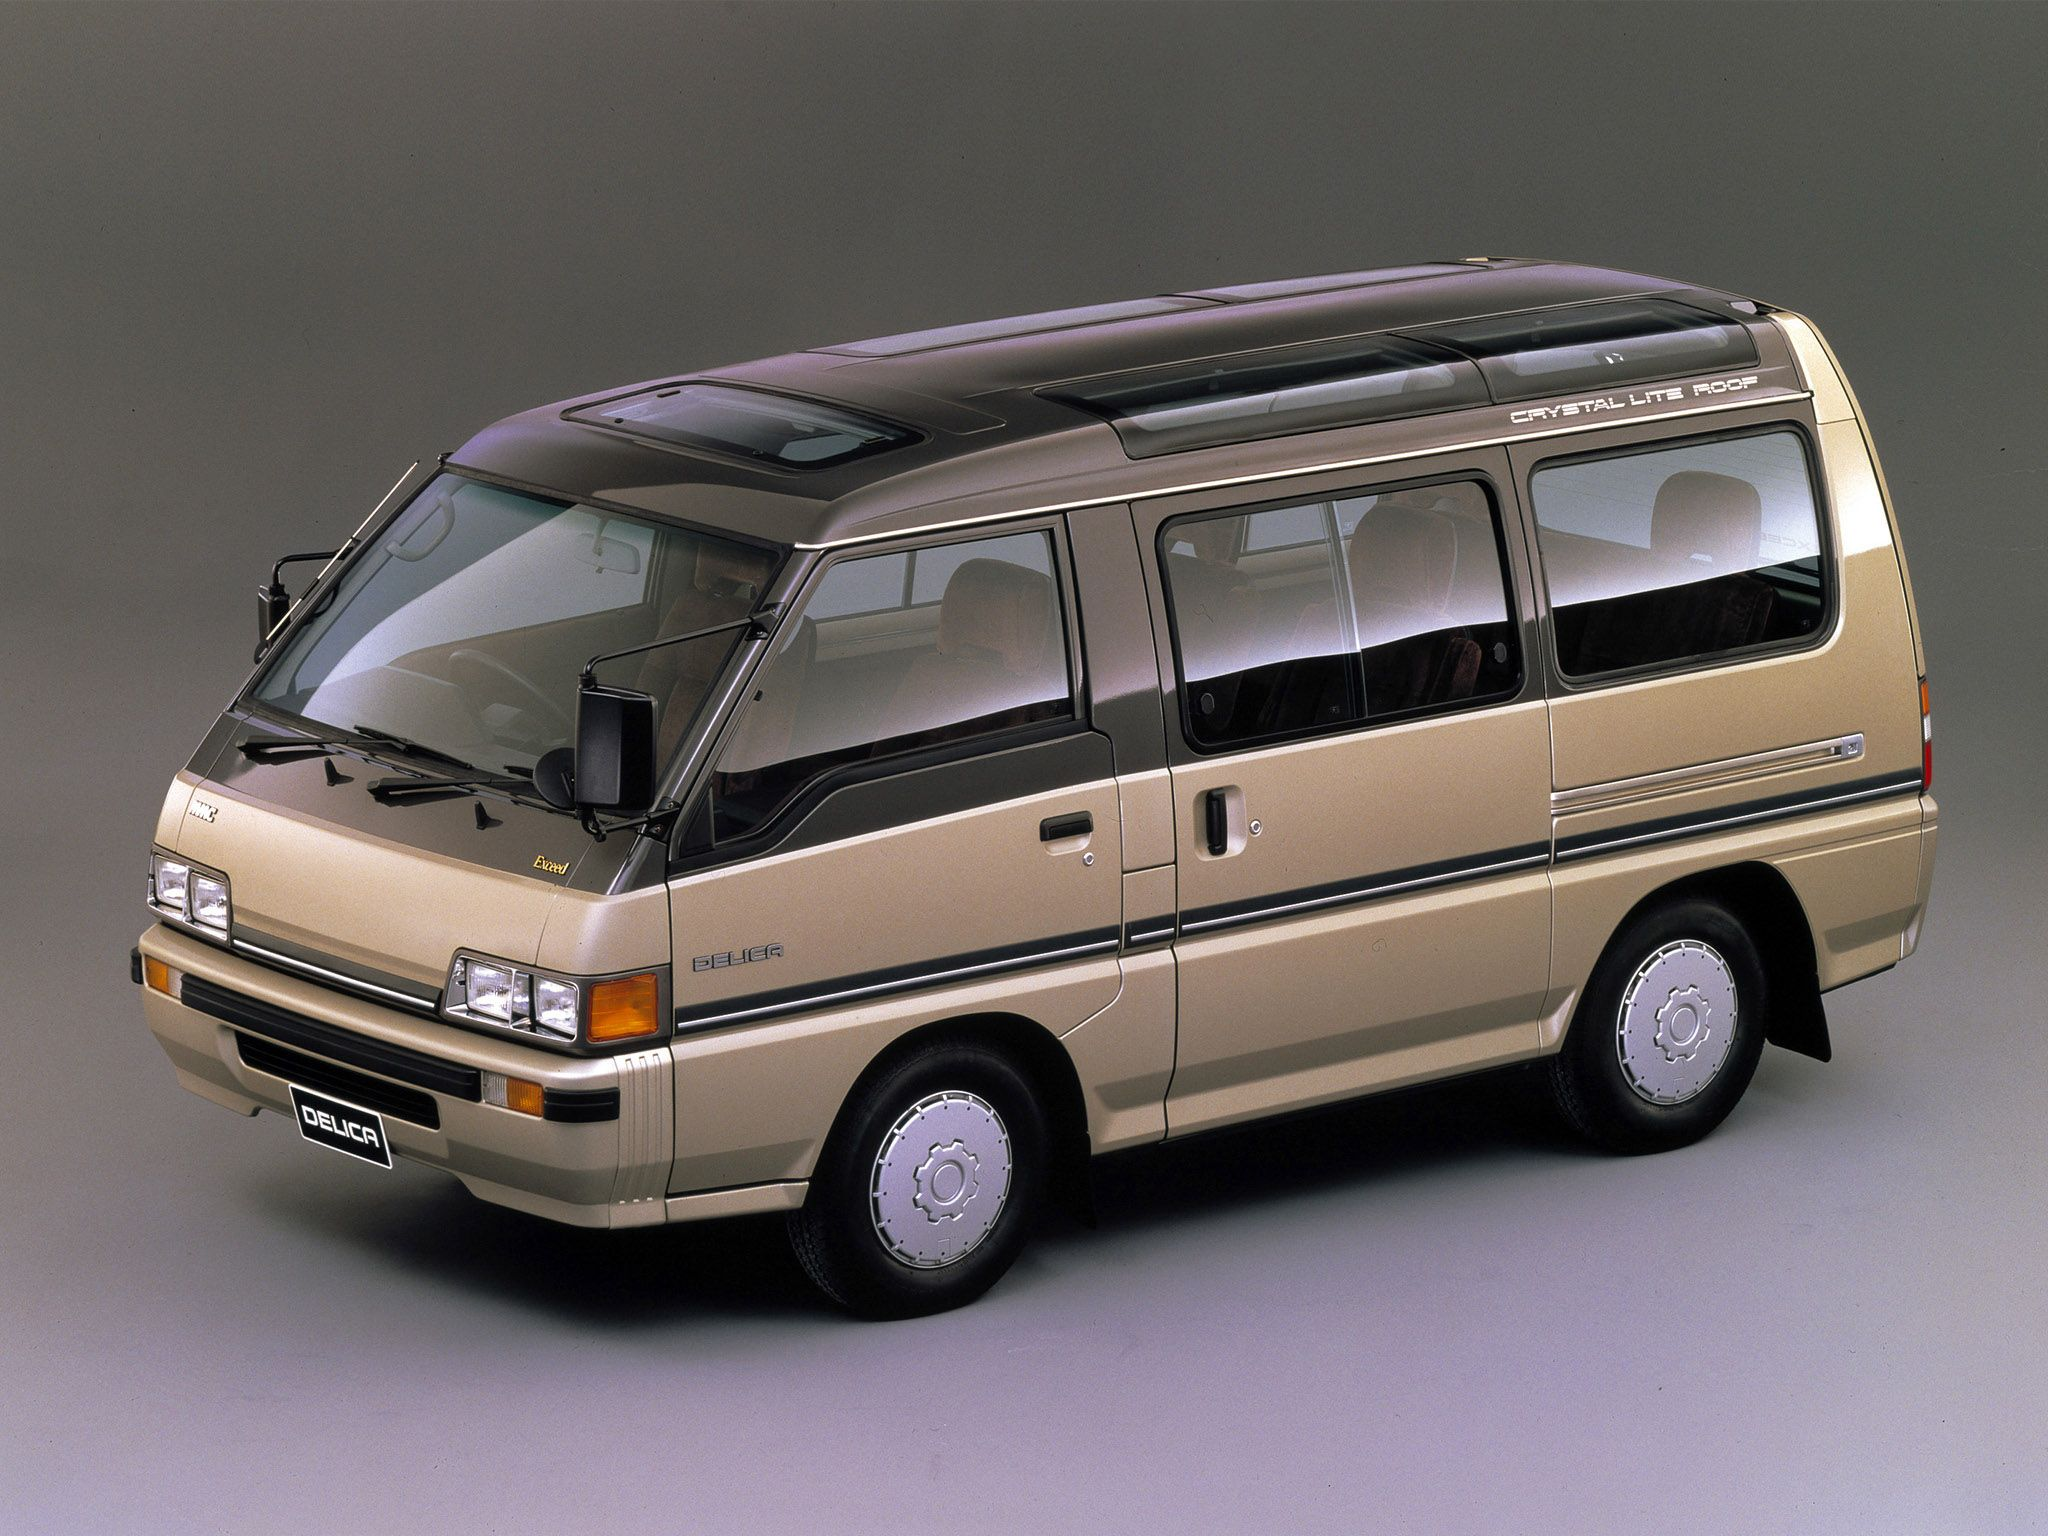 Mitsubishi delica space gear mitsubishi pinterest cars 4x4 and wheels